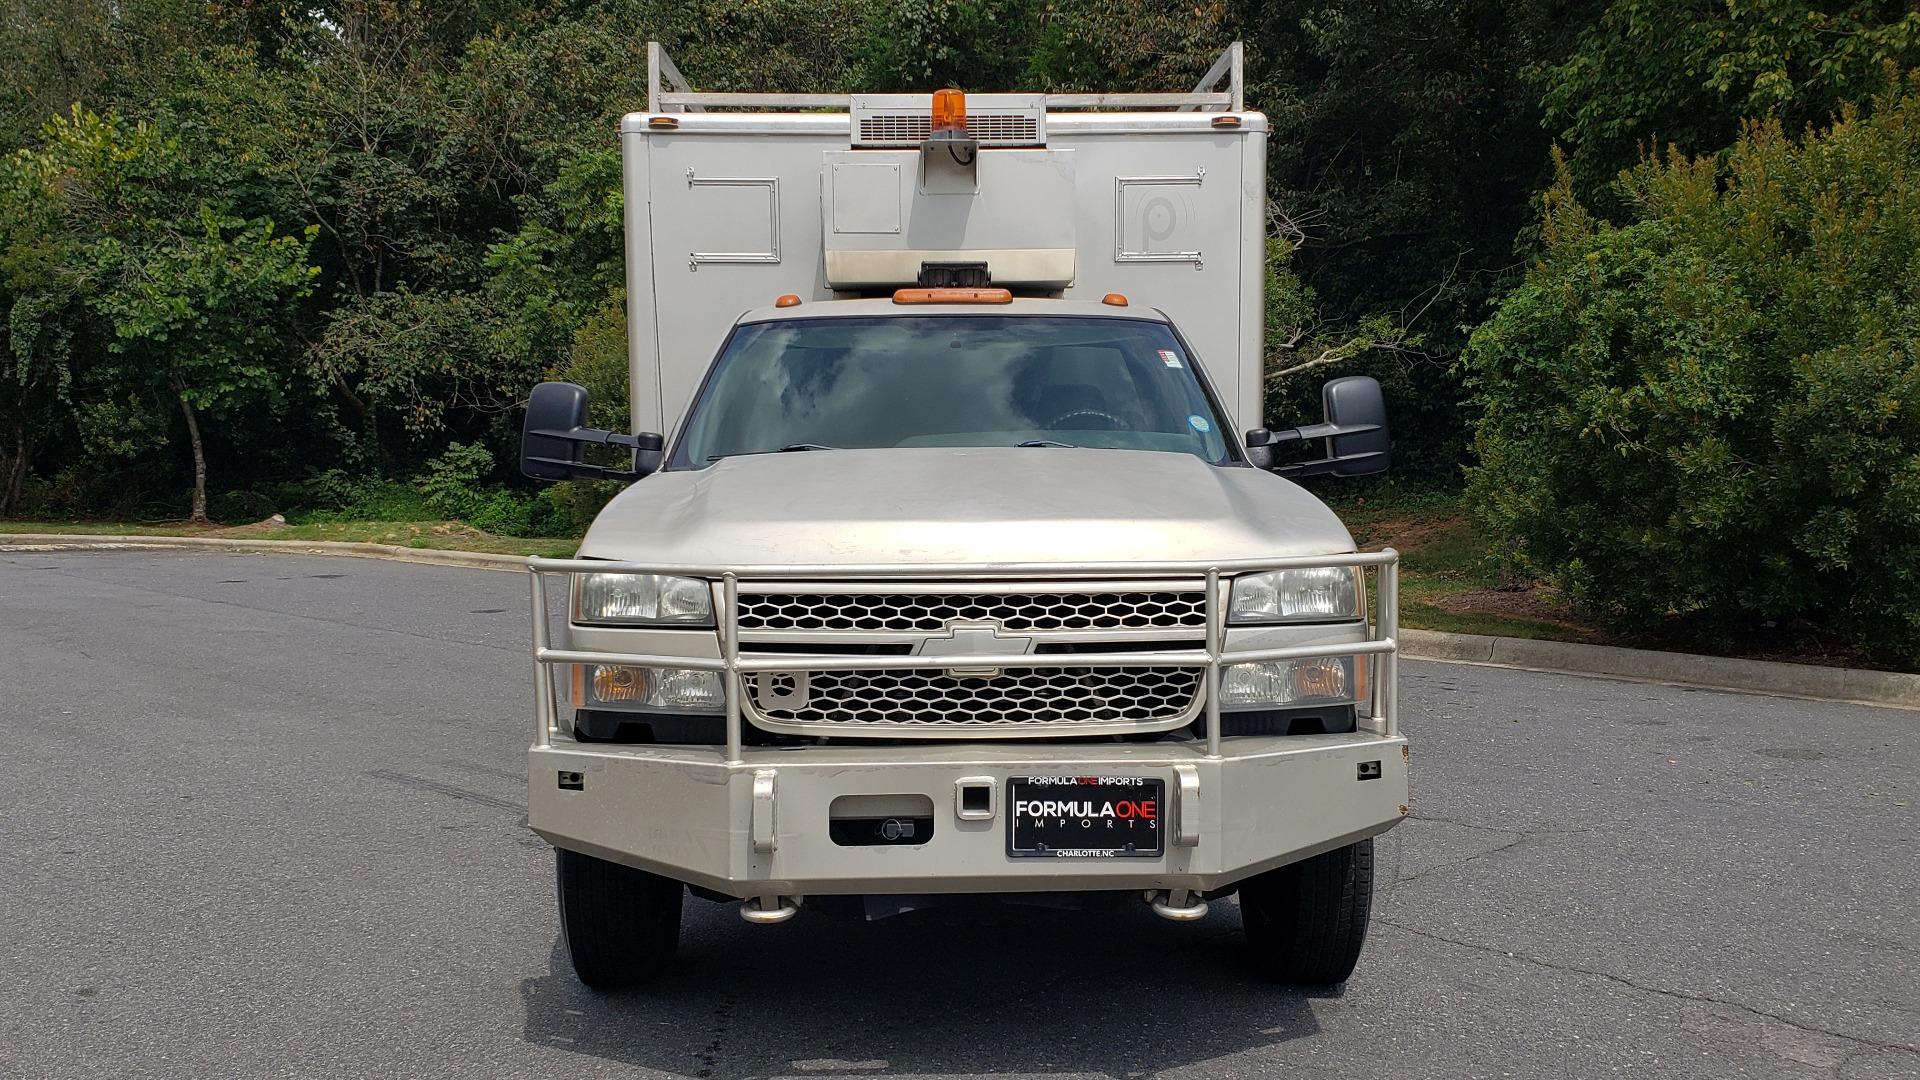 Used 2005 Chevrolet SILVERADO 3500 DRW / 4WD / REG CAB / 6.6L DURAMAX / DOOMSDAY PREPPER for sale $21,595 at Formula Imports in Charlotte NC 28227 7